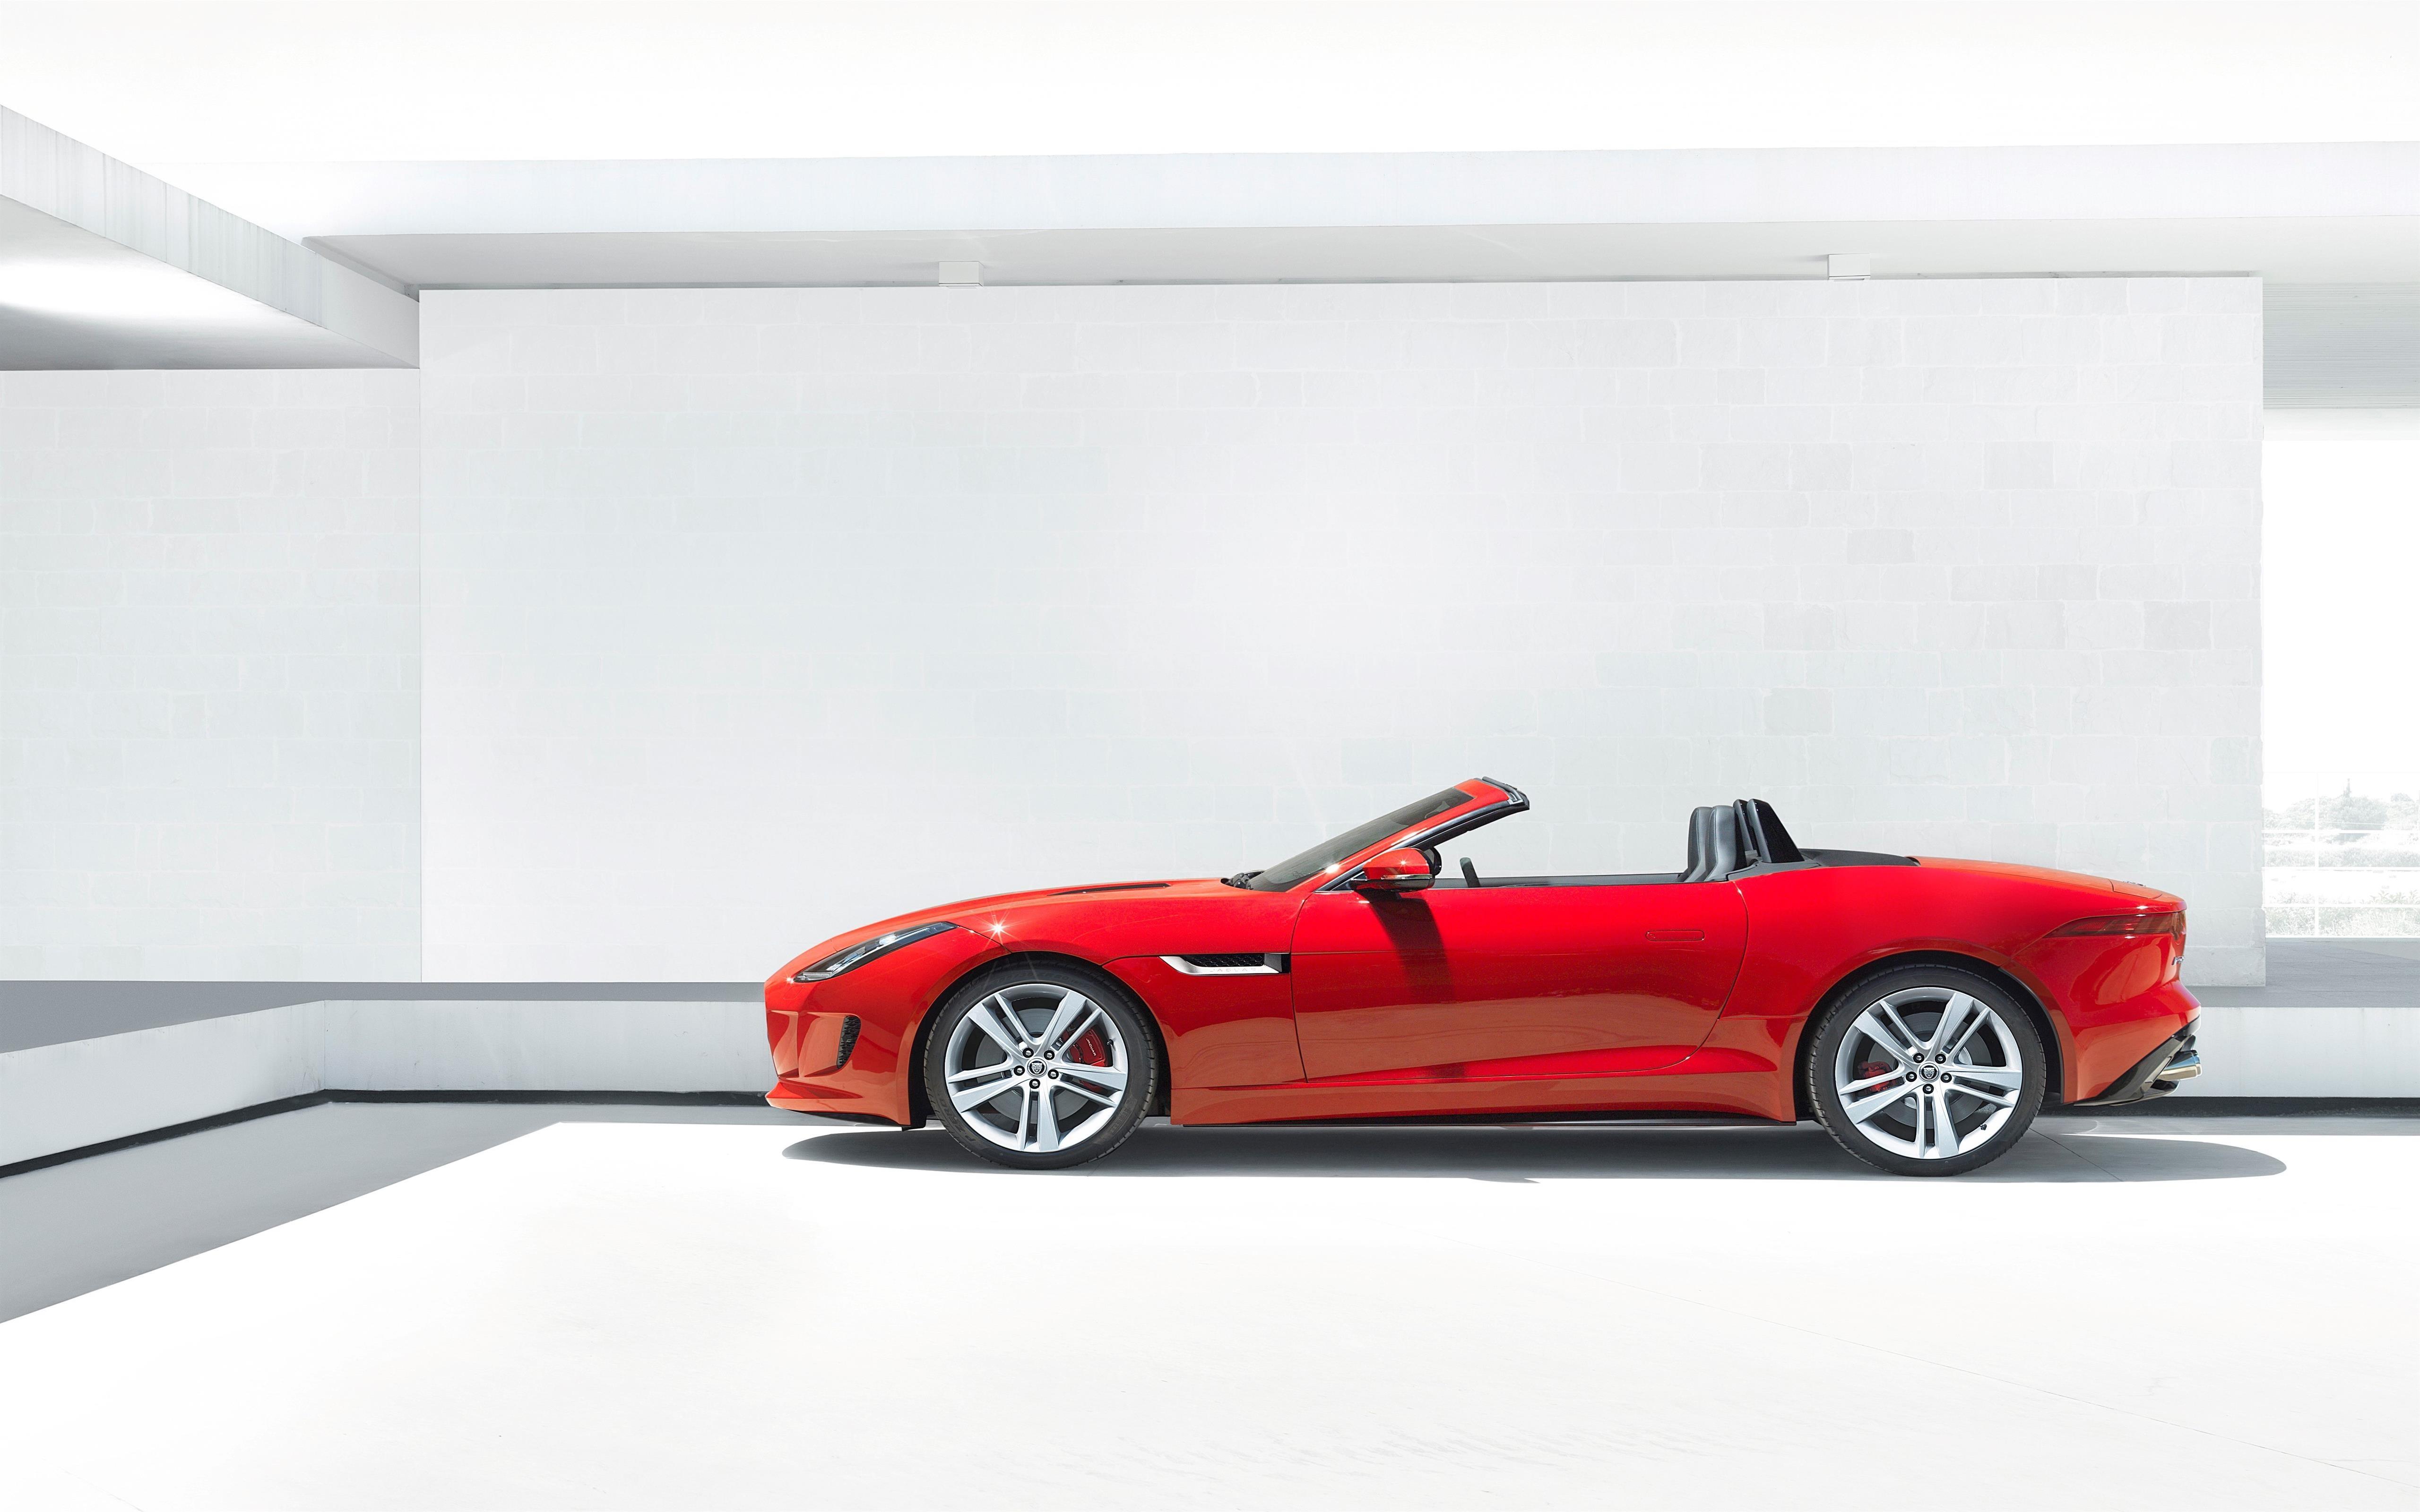 Red Convertible 2 Seater Jaguar Luxury Car Wallpaper 5120x3200